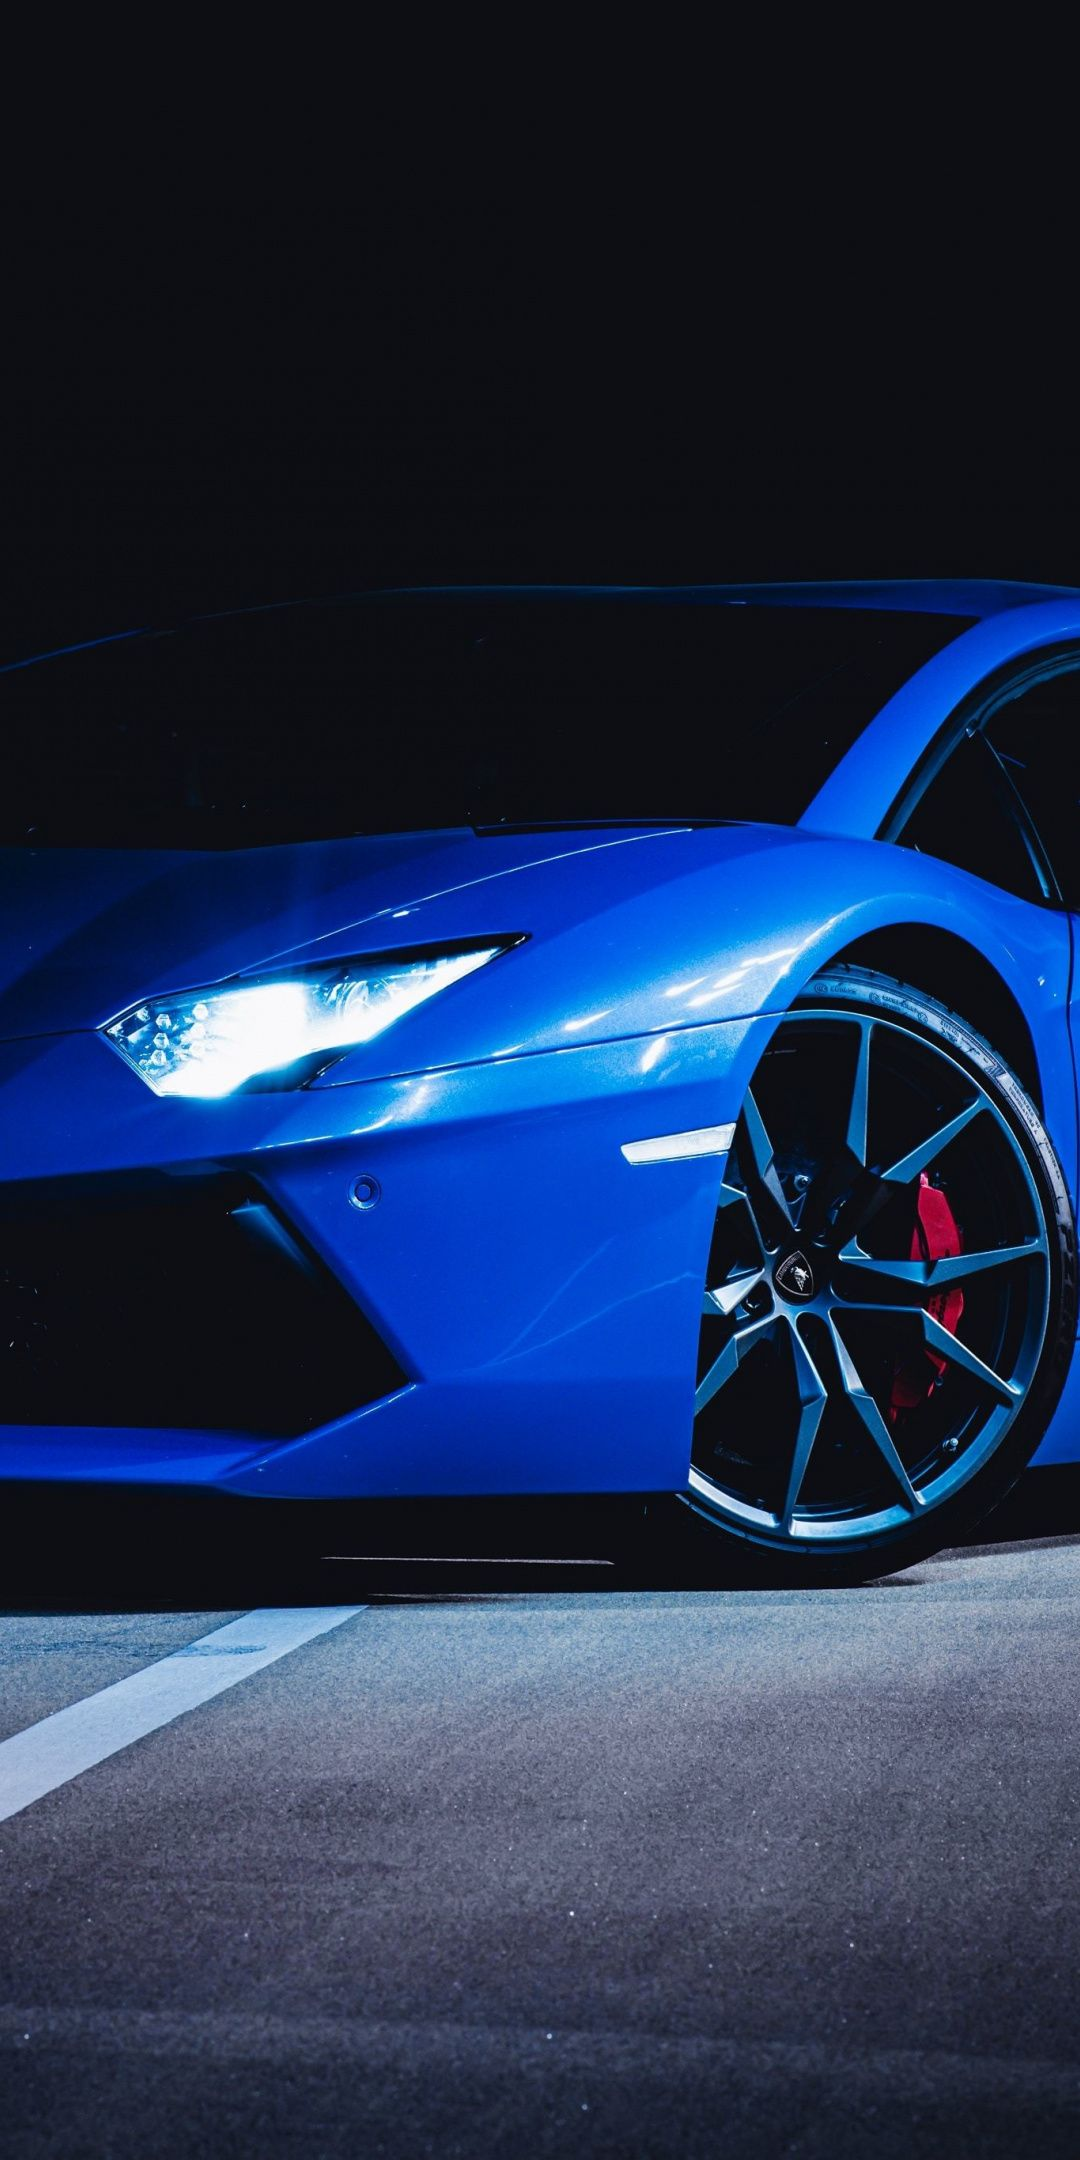 1080x2160 Sports Car Blue Lamborghini Wallpaper In 2020 Blue Lamborghini Sports Car Wallpaper Sports Car